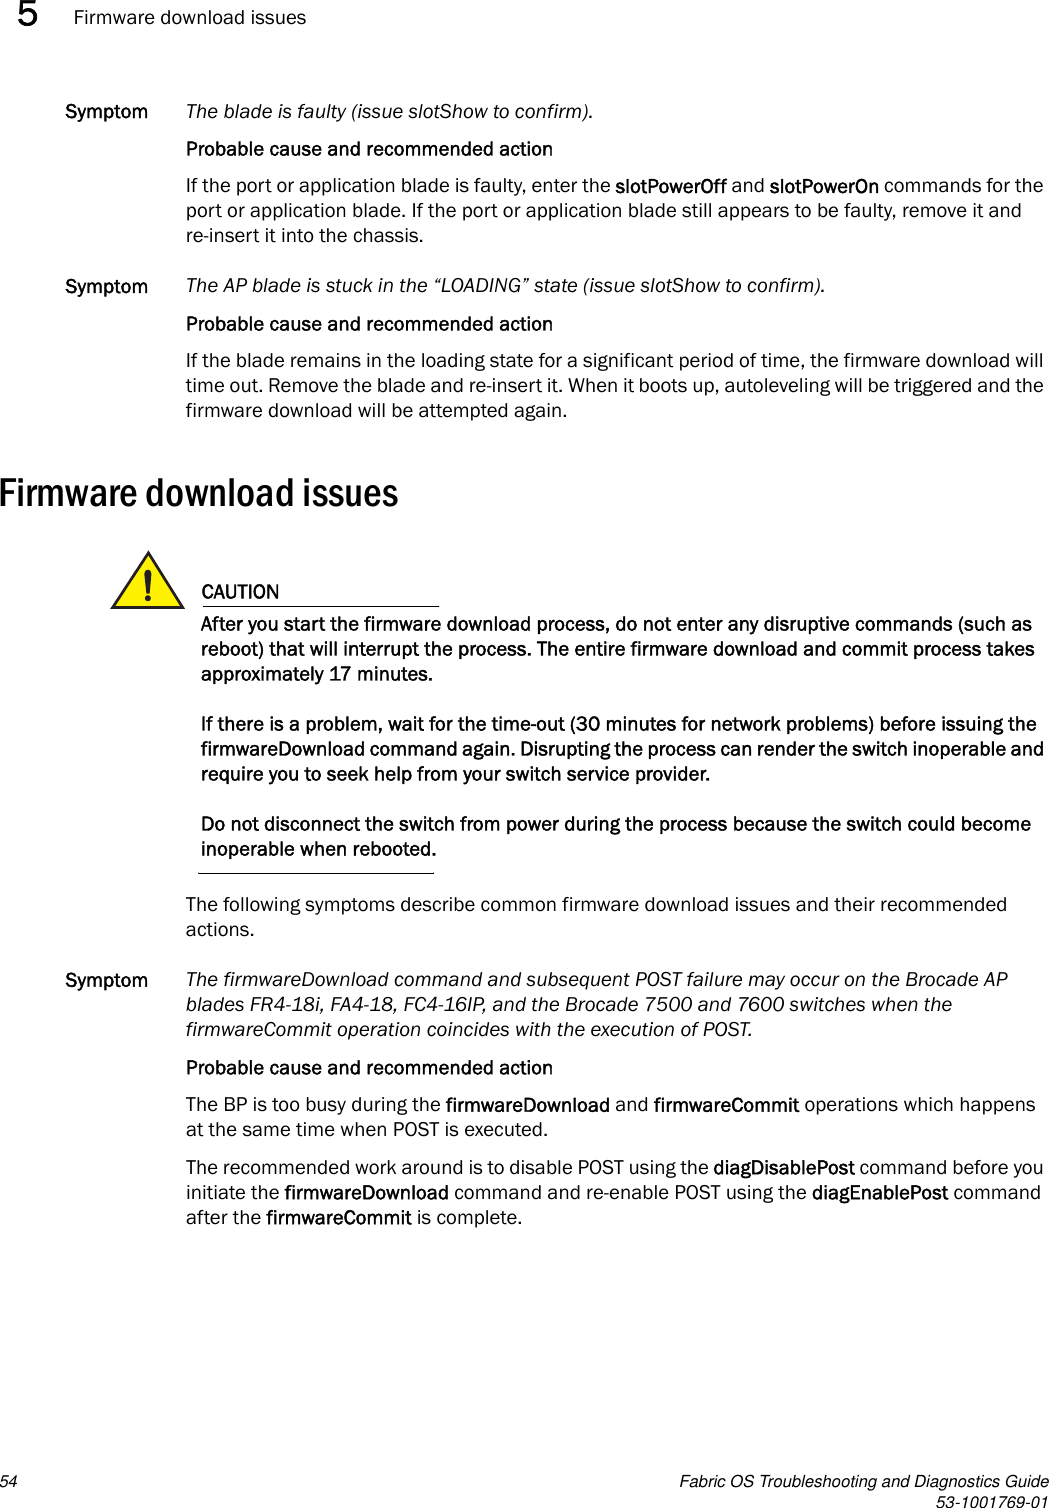 Dell Poweredge M1000E Troubleshooting And Diagnostics Guide